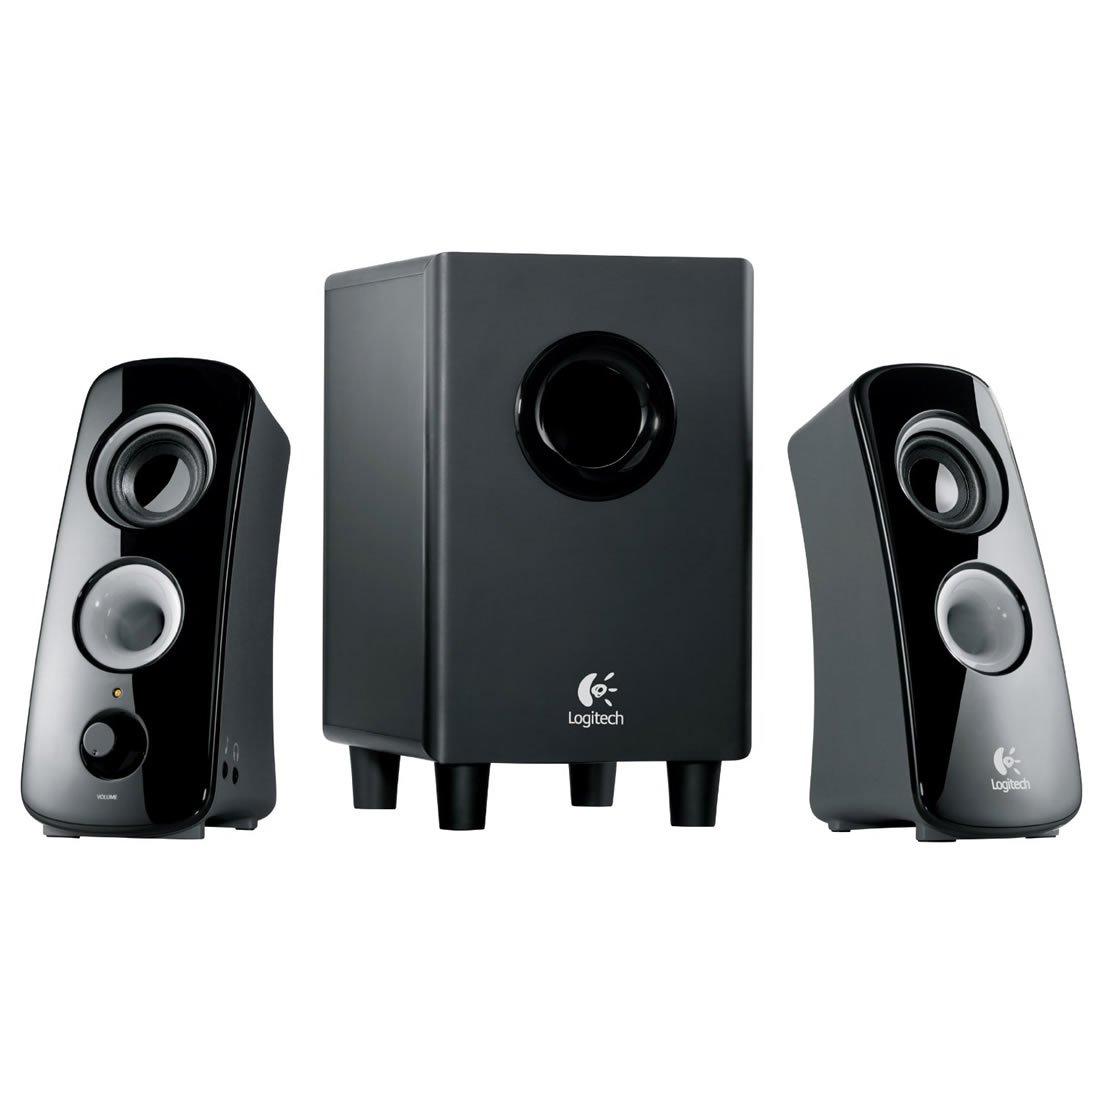 Amazon.com: Logitech Z323 3 Piece 2.1 Channel Computer Multimedia Speaker  System - Black: Computers & Accessories